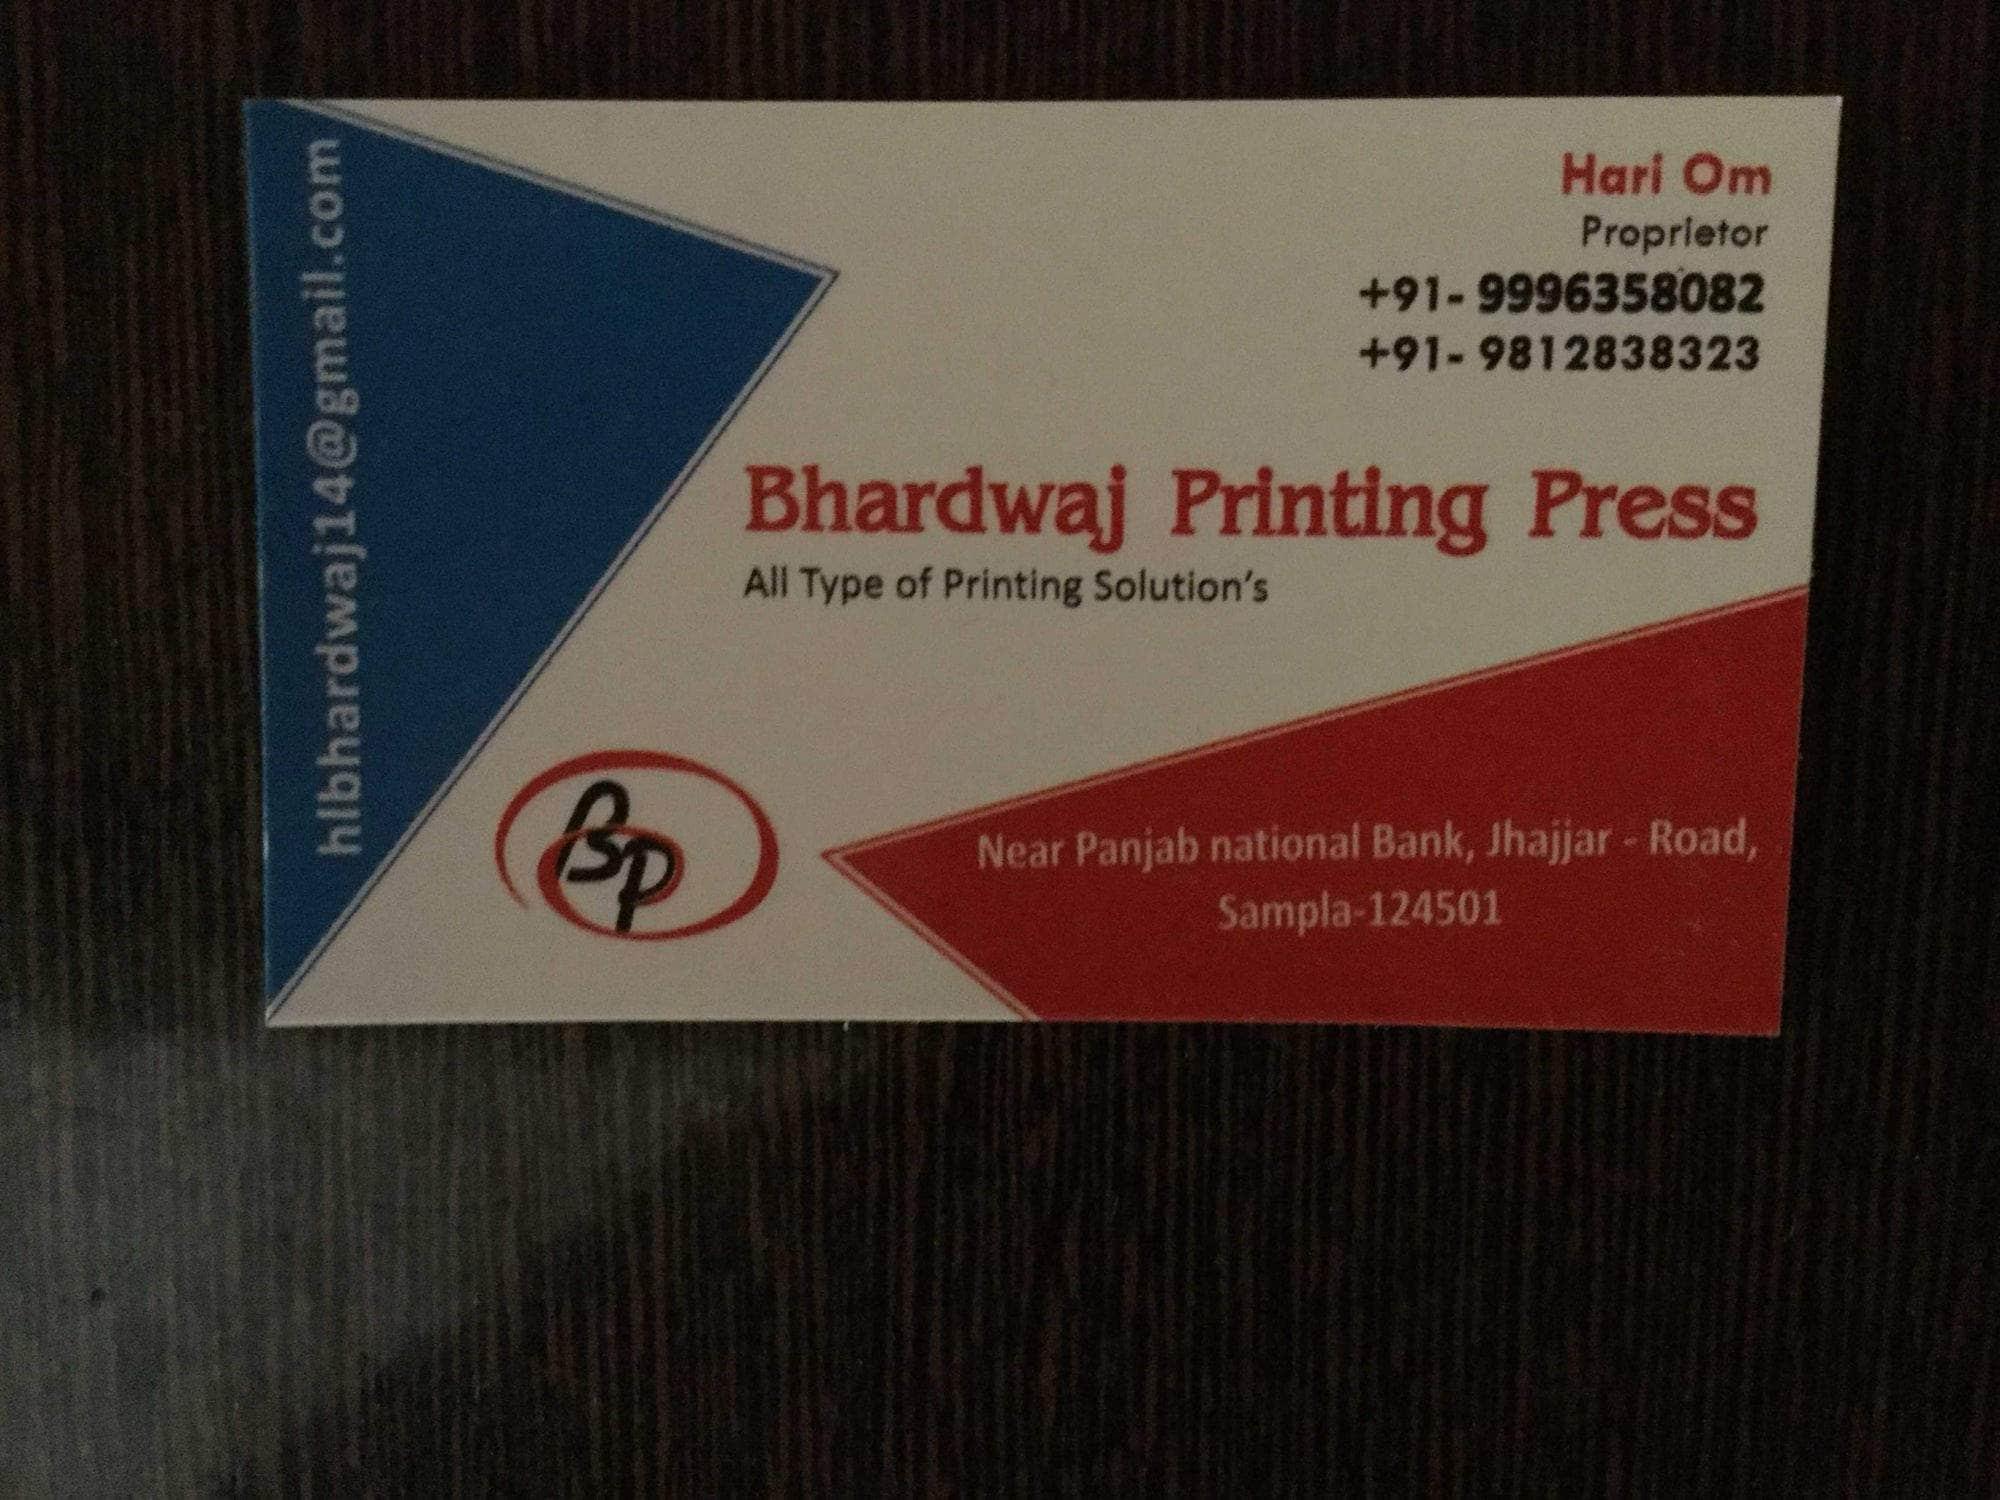 Wedding Card Dealers in Rohtak - Wedding Invitation Card Dealers ...